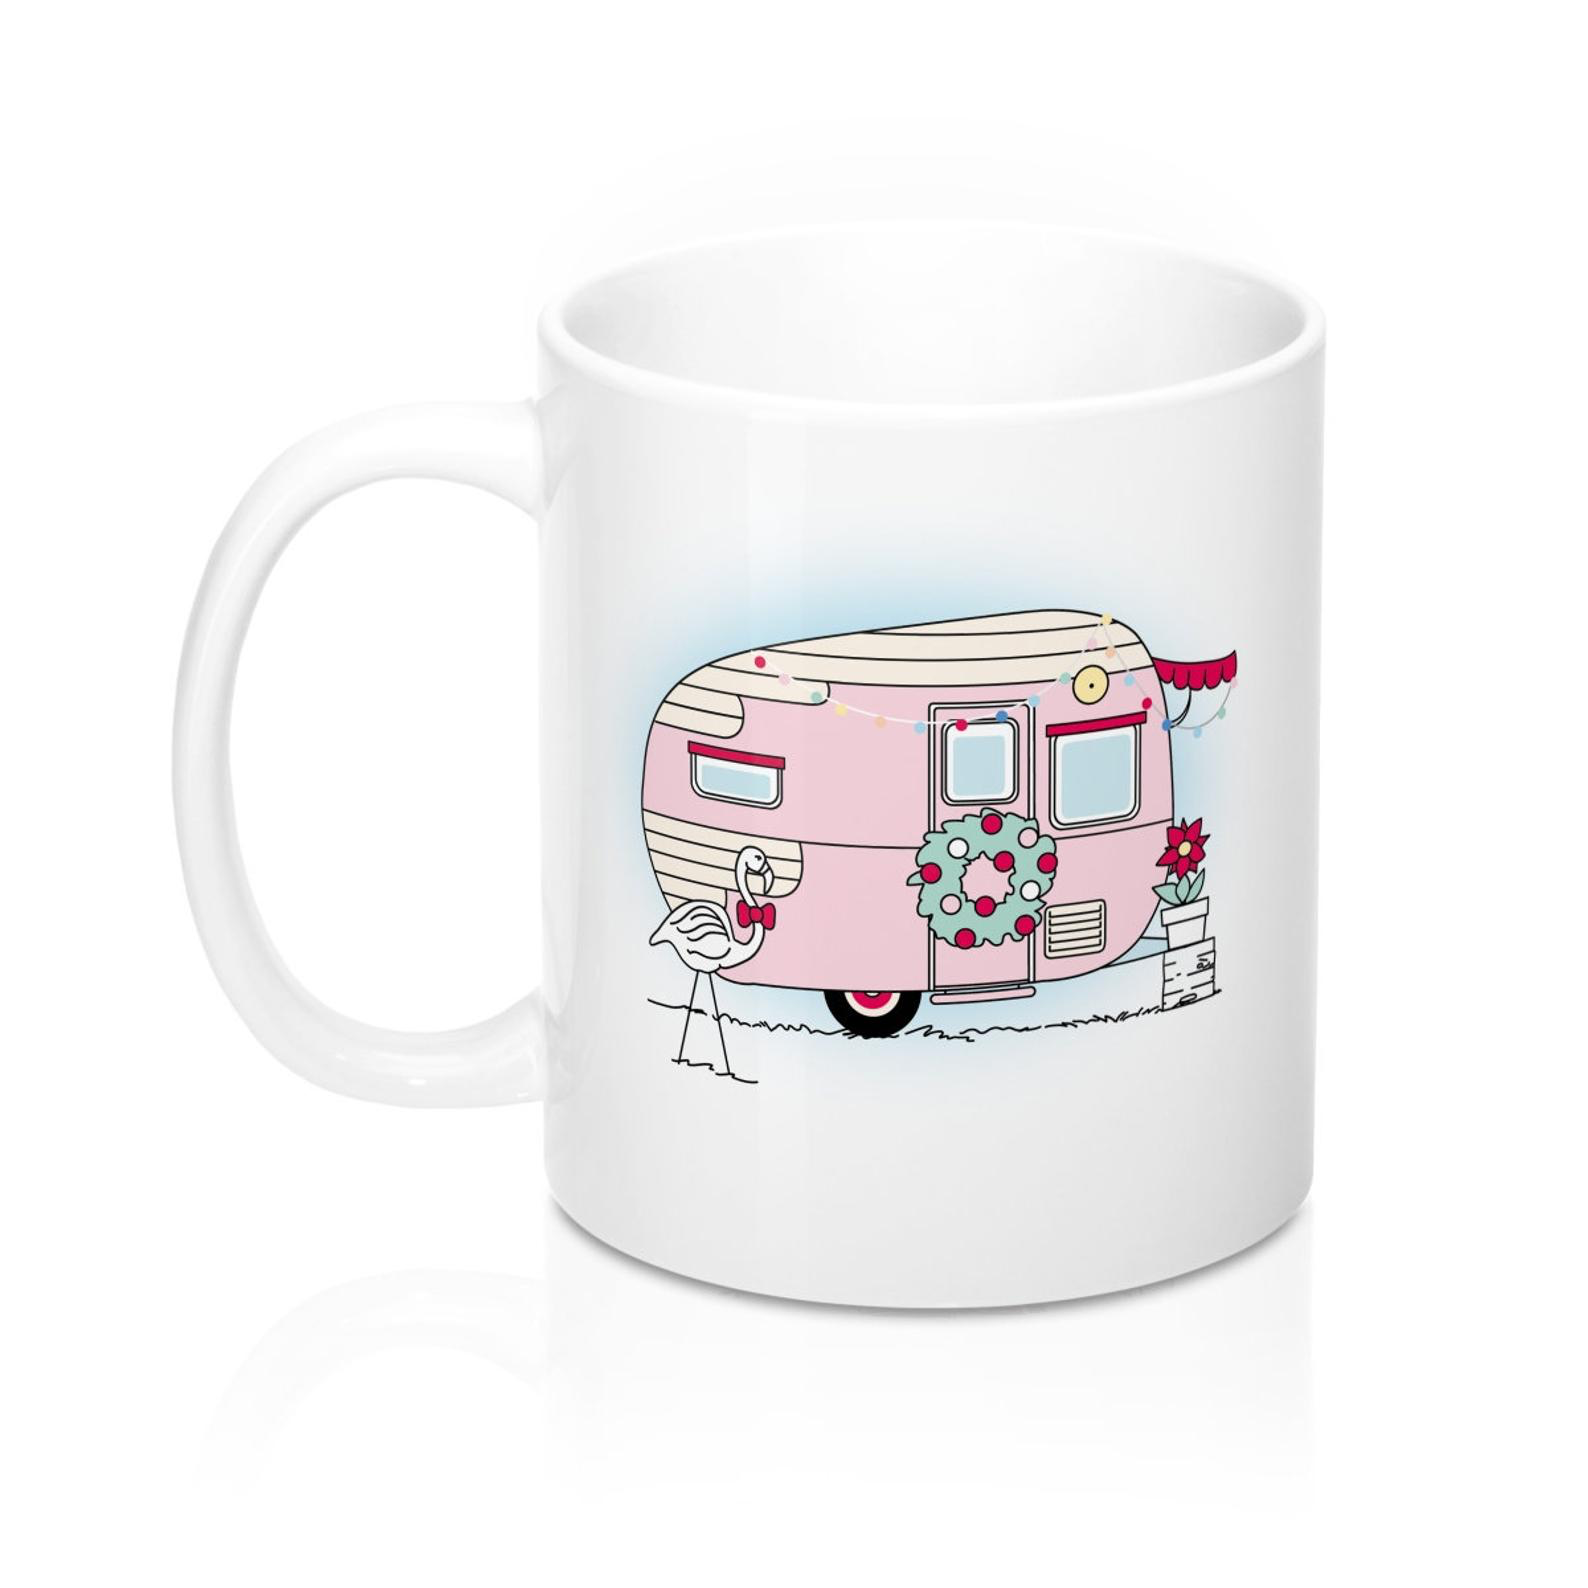 Christmas Camper Mug Pink Mug Christmas Mug Vintage Caravan Vintage Rv Vintage Camper Glamping Mug Christmas Mugs Vintage Camper Mugs